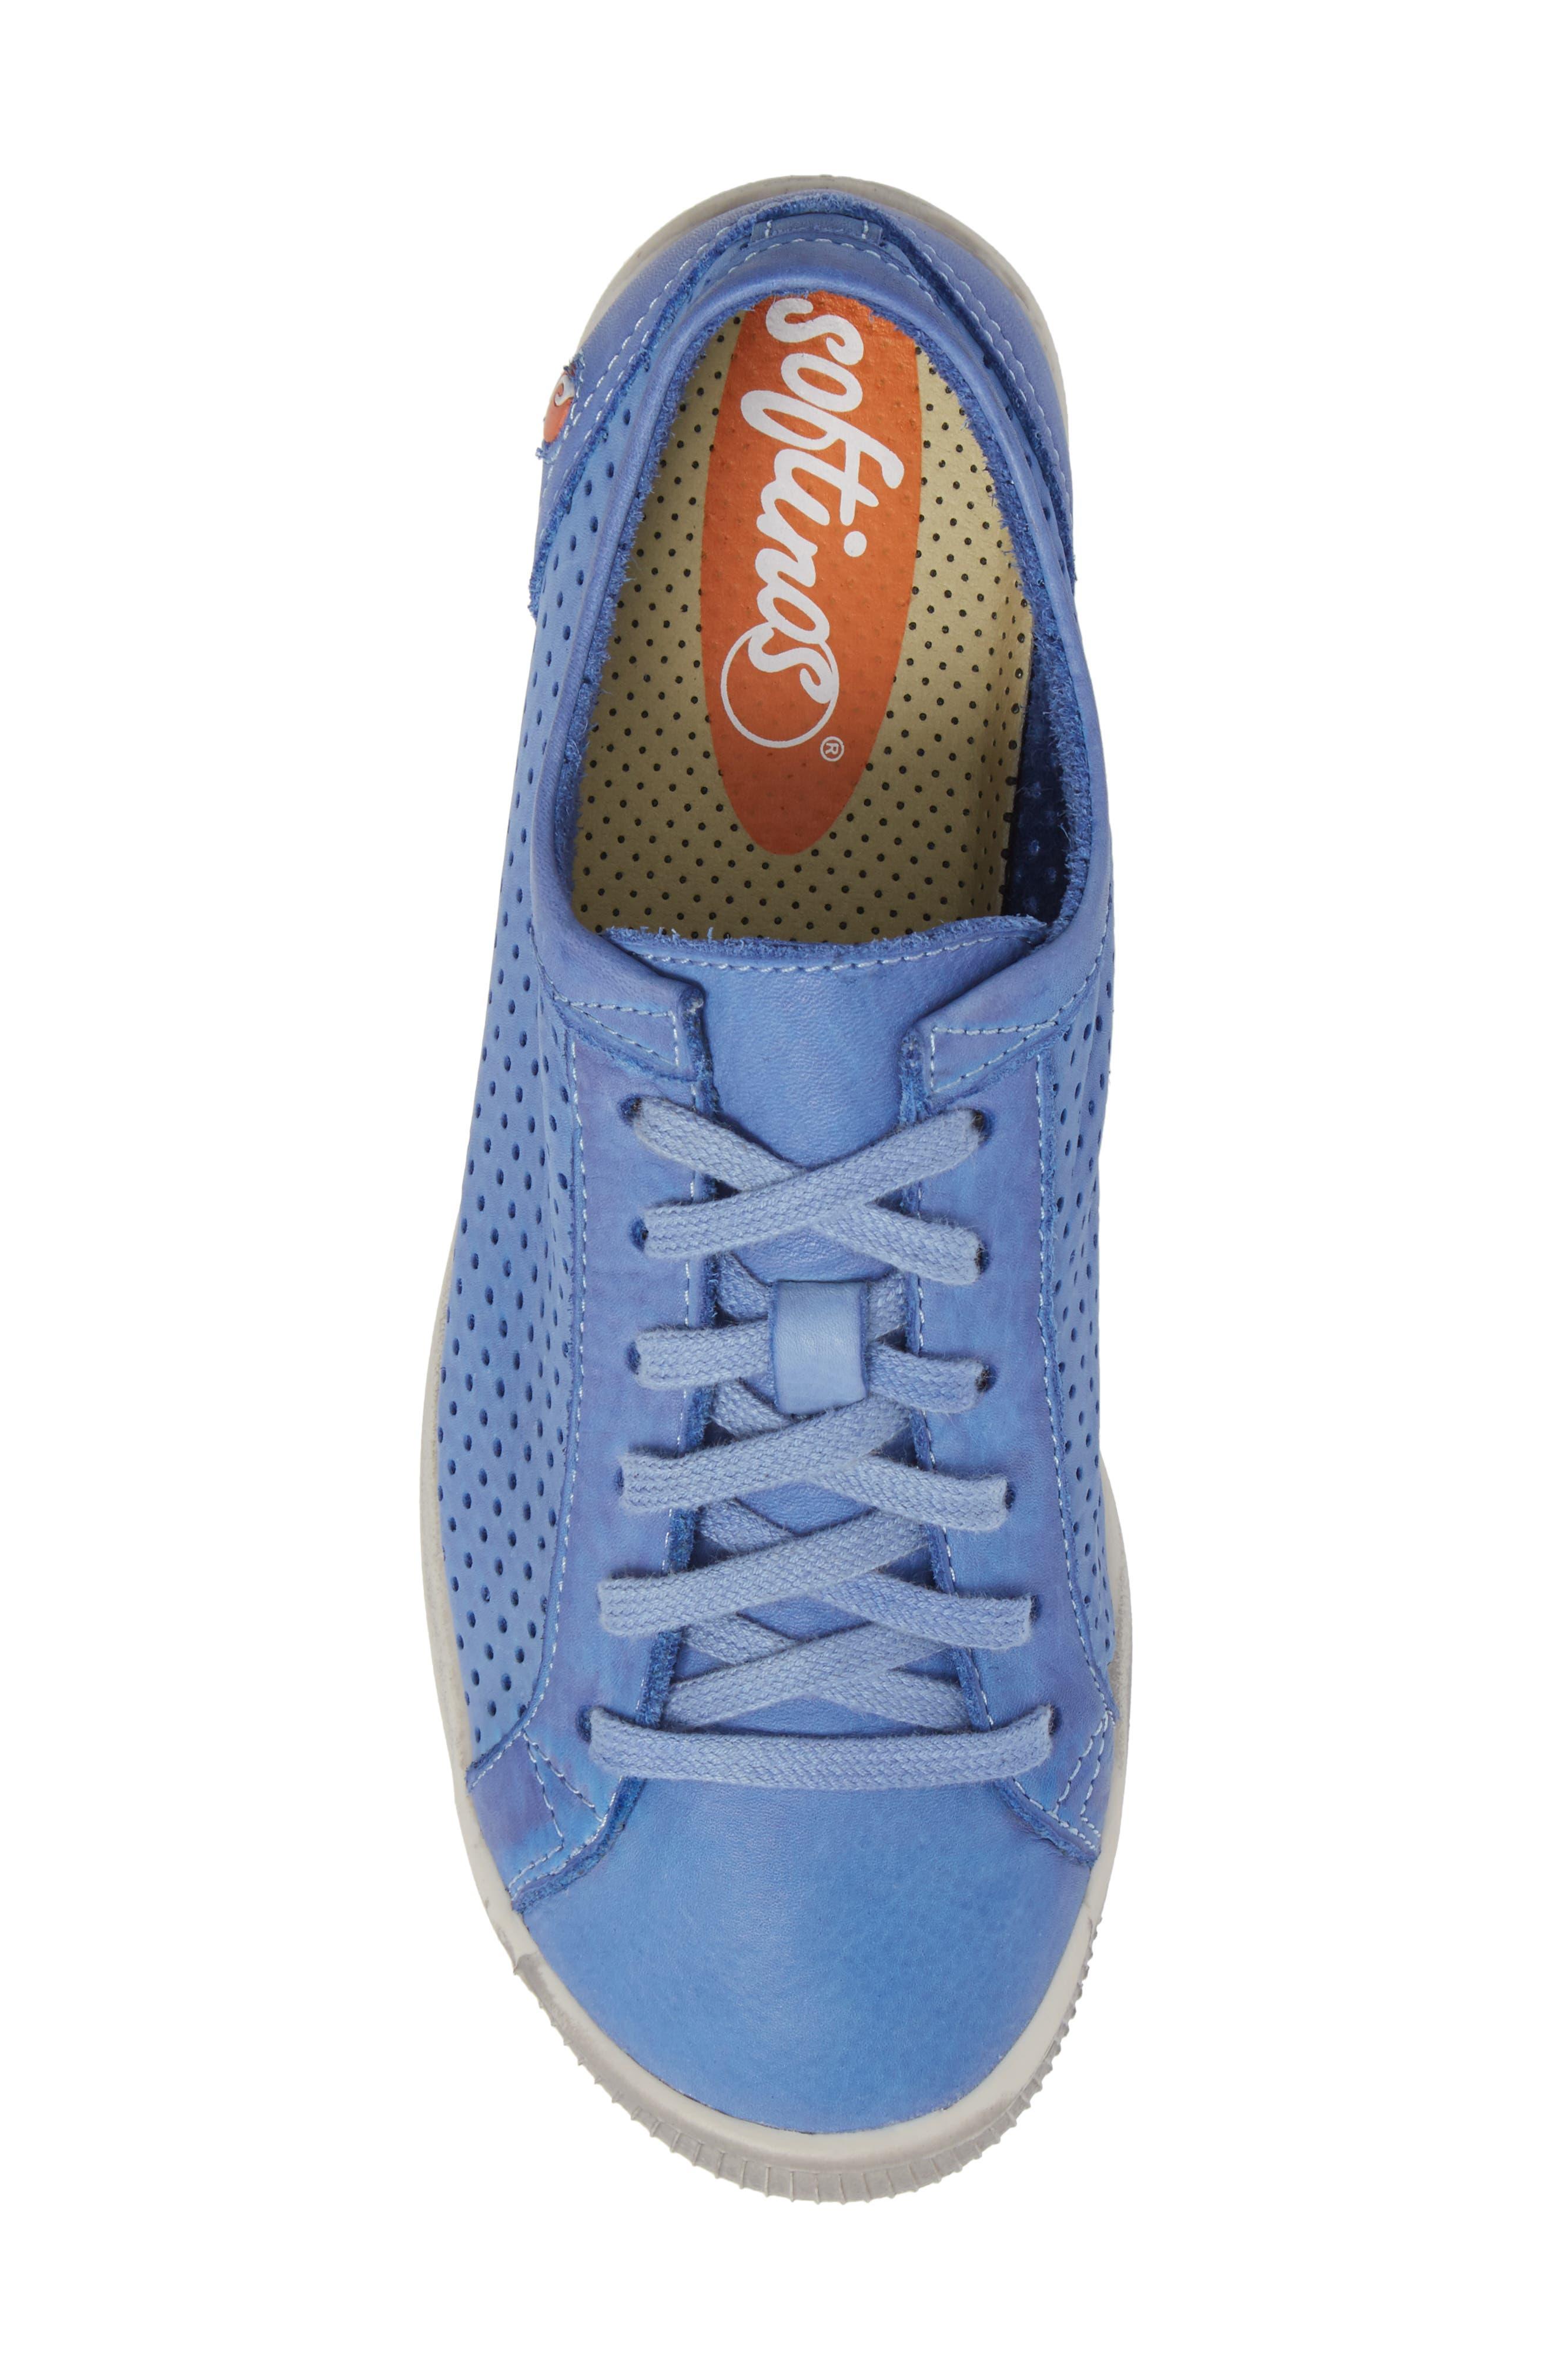 Ica Sneaker,                             Alternate thumbnail 5, color,                             Lavender Leather